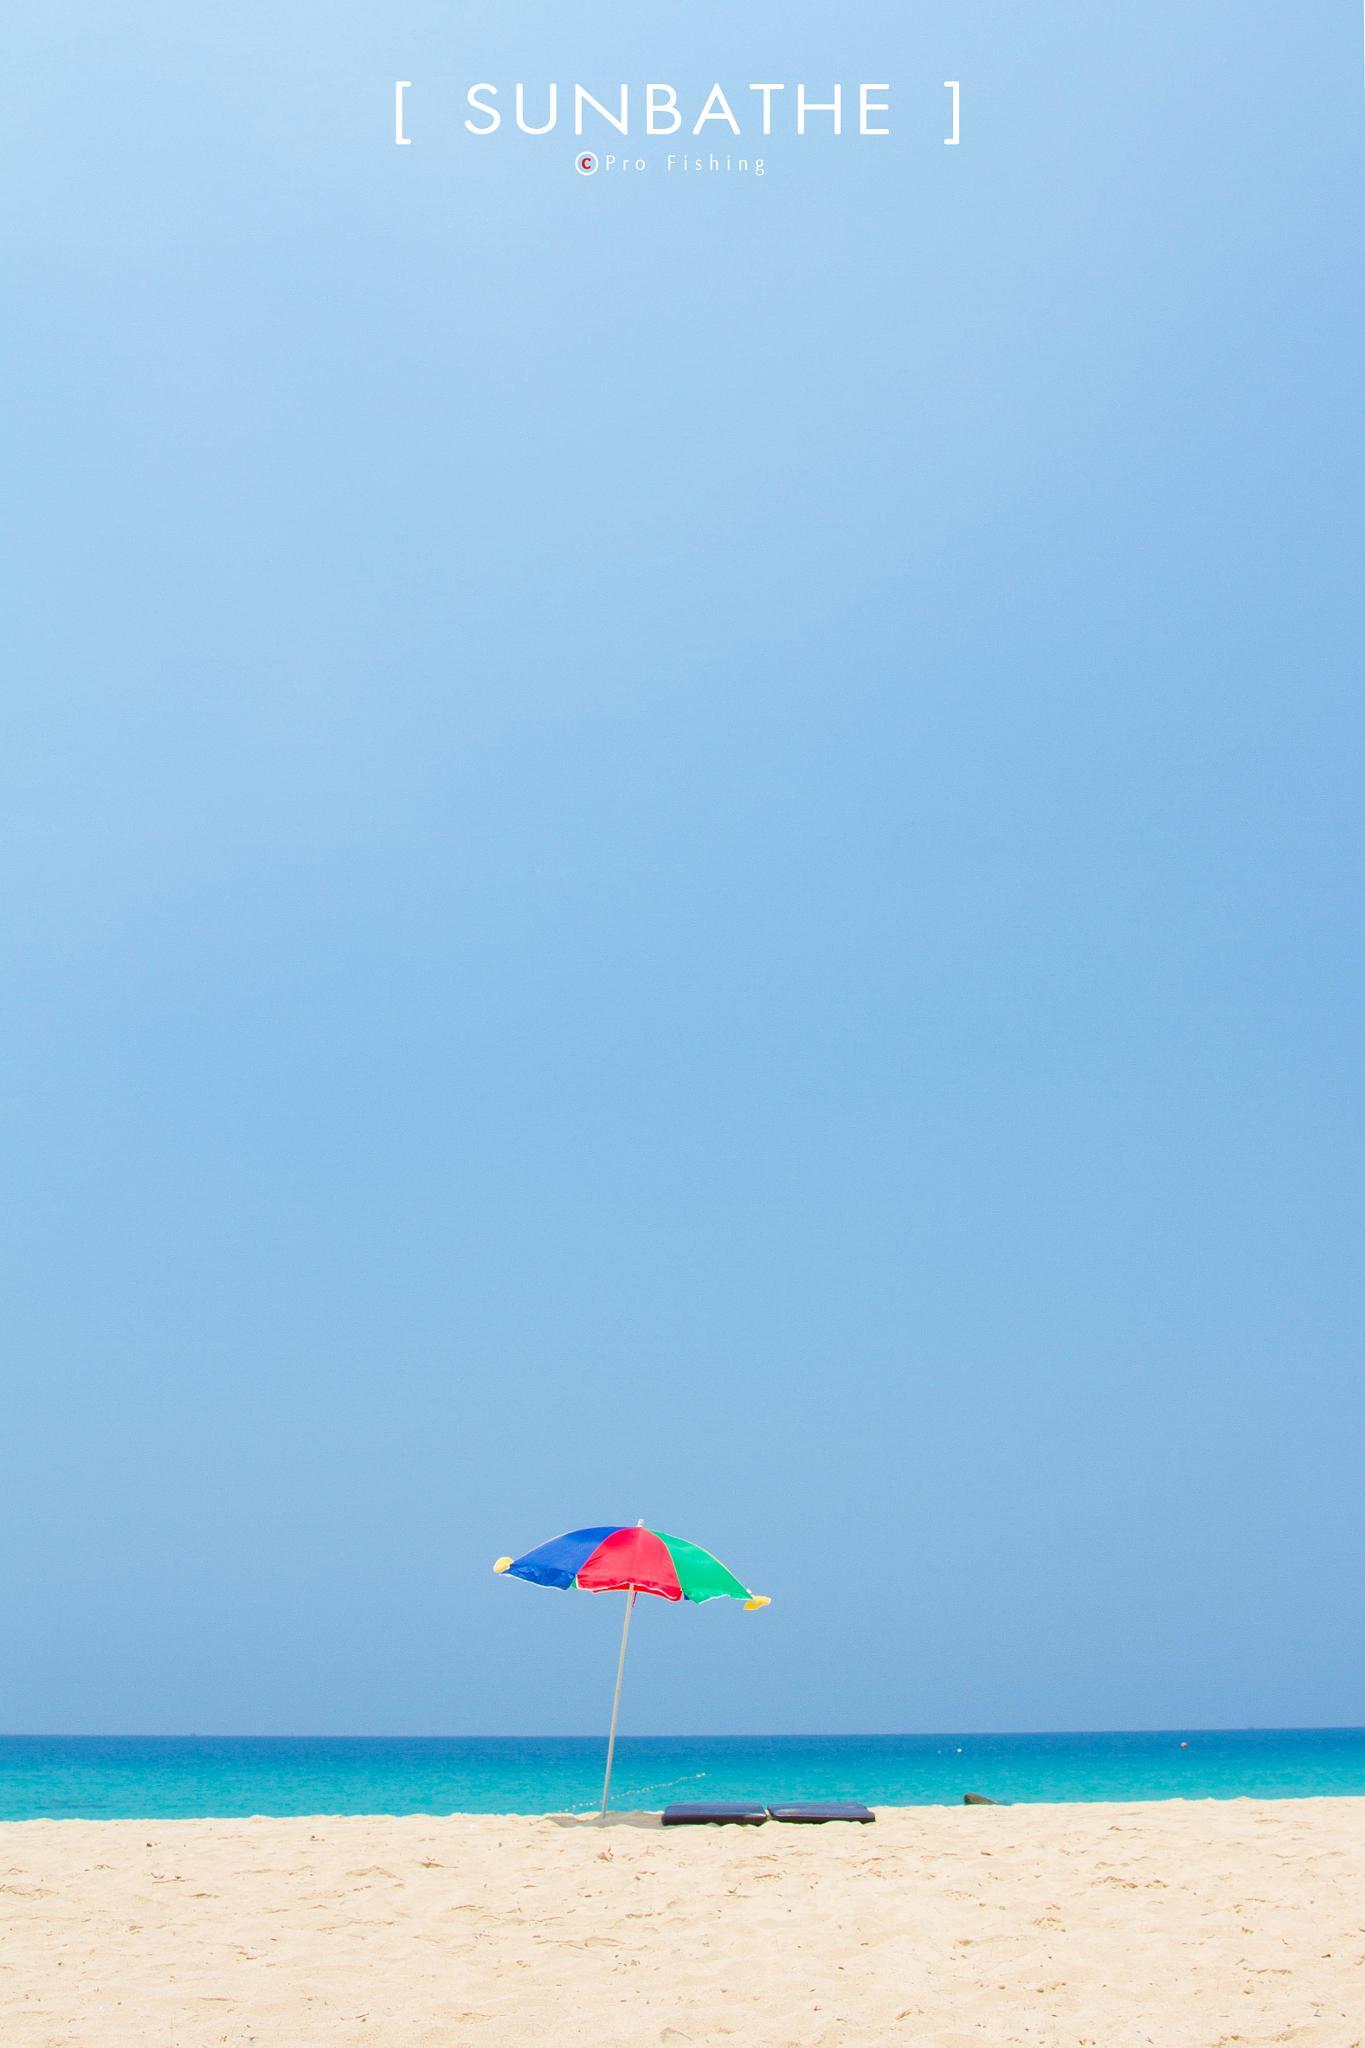 Sunbathe  by Pro Fishing Photographer